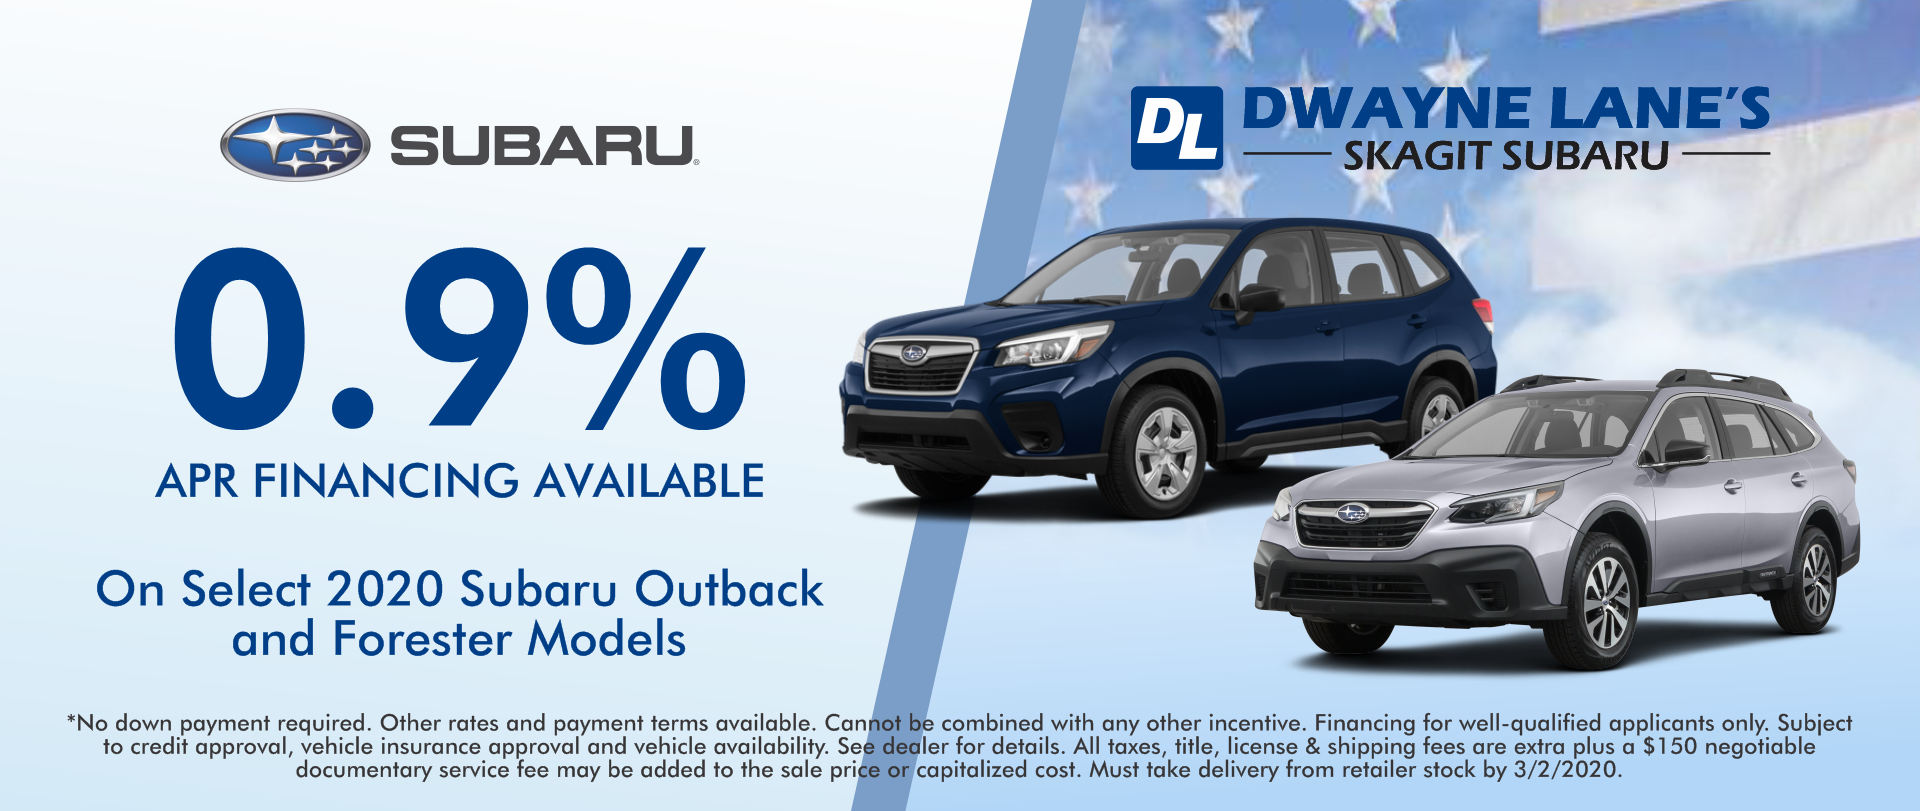 Dwayne Lane's Skagit Subaru - 0.9% APR on select models